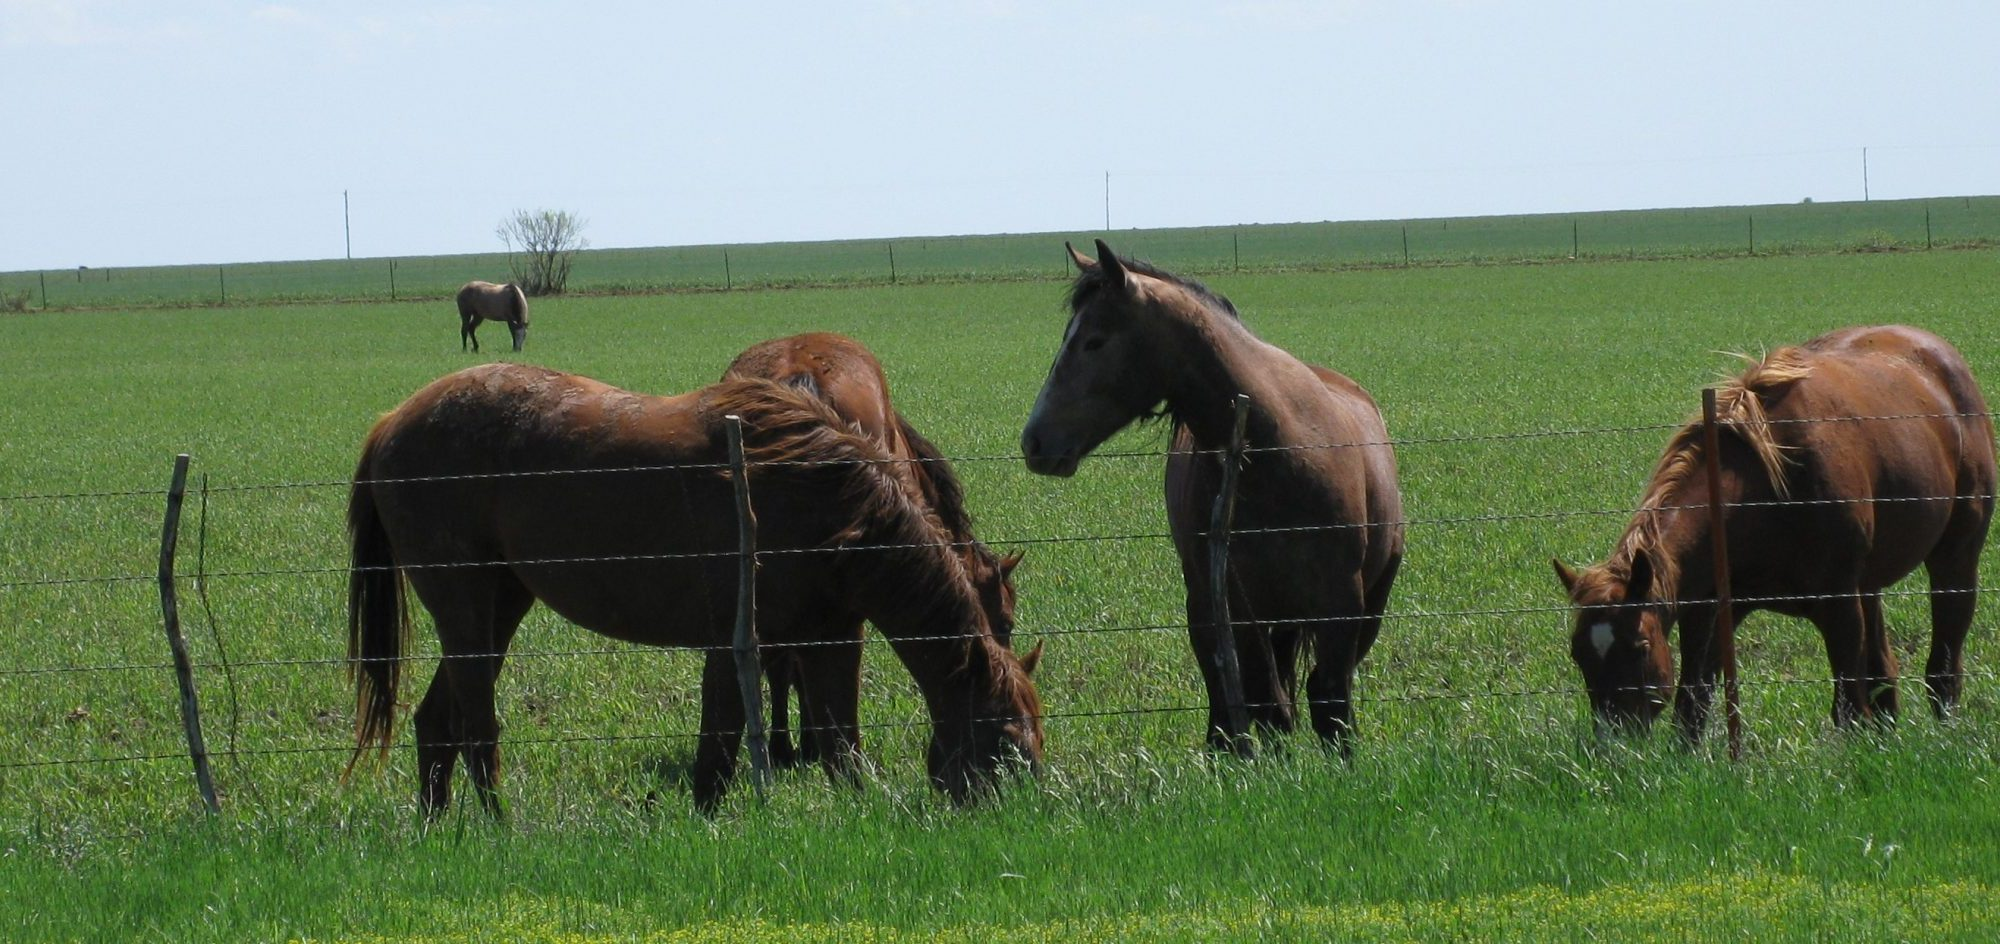 five horses in grass field